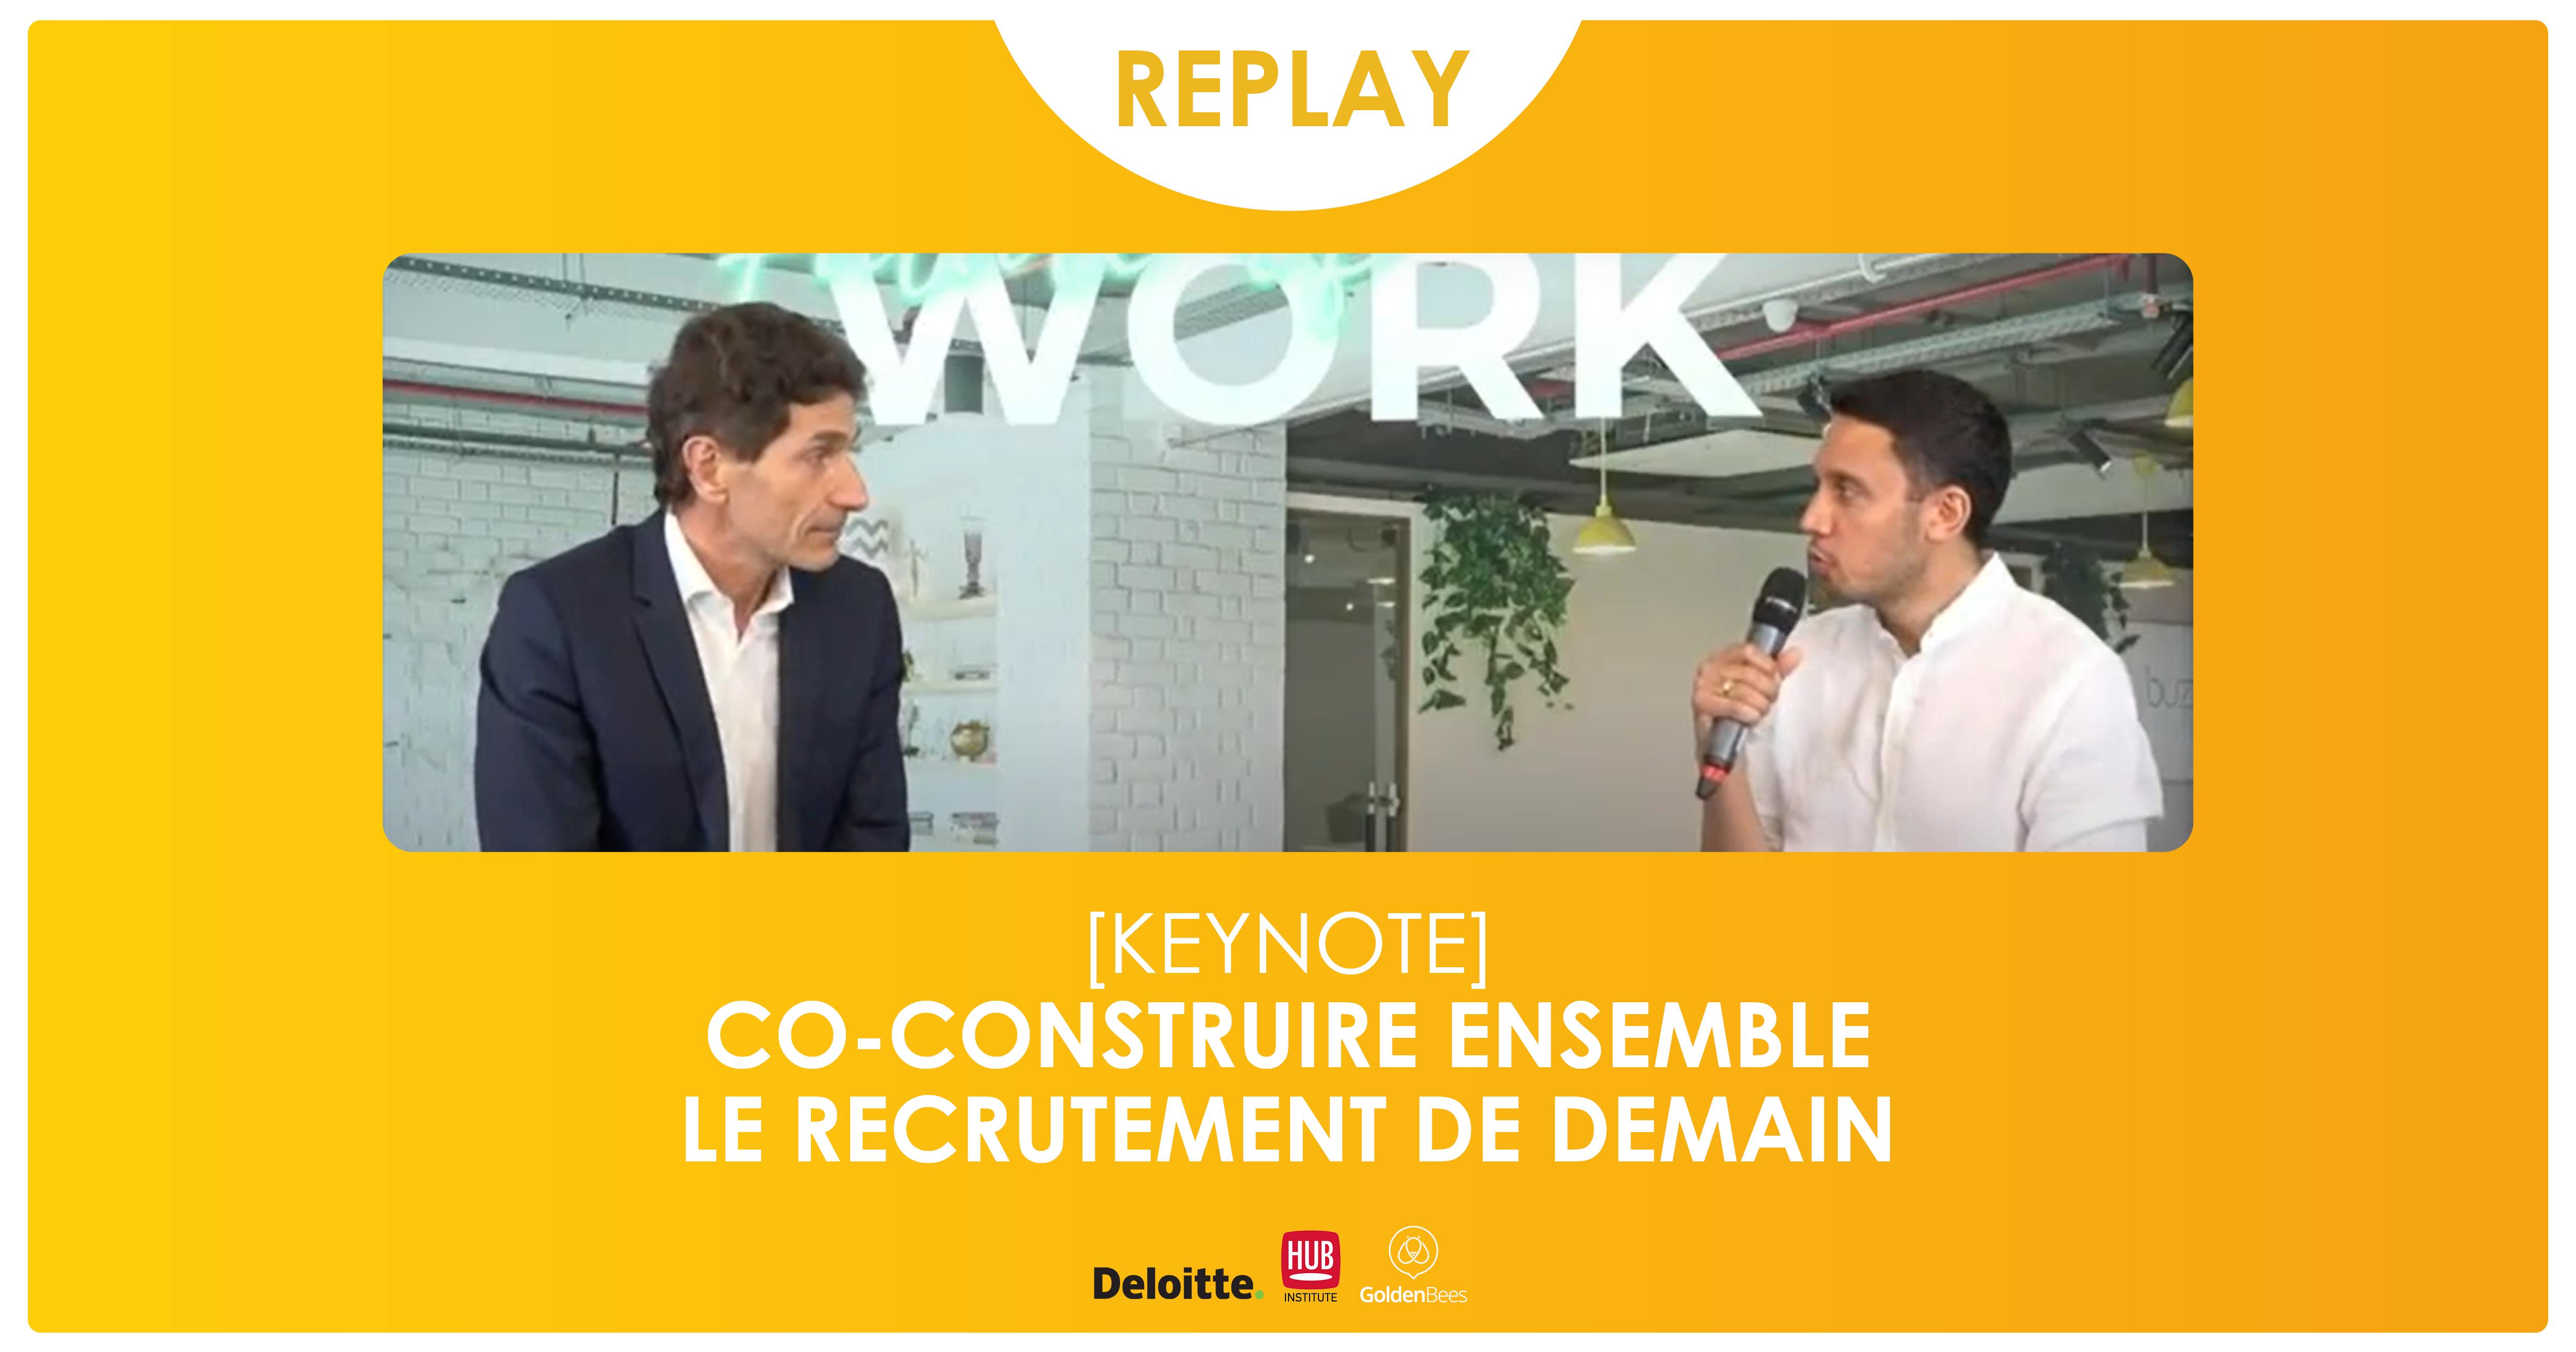 Replay Keynote Co-construire ensemble le recrutement de demain